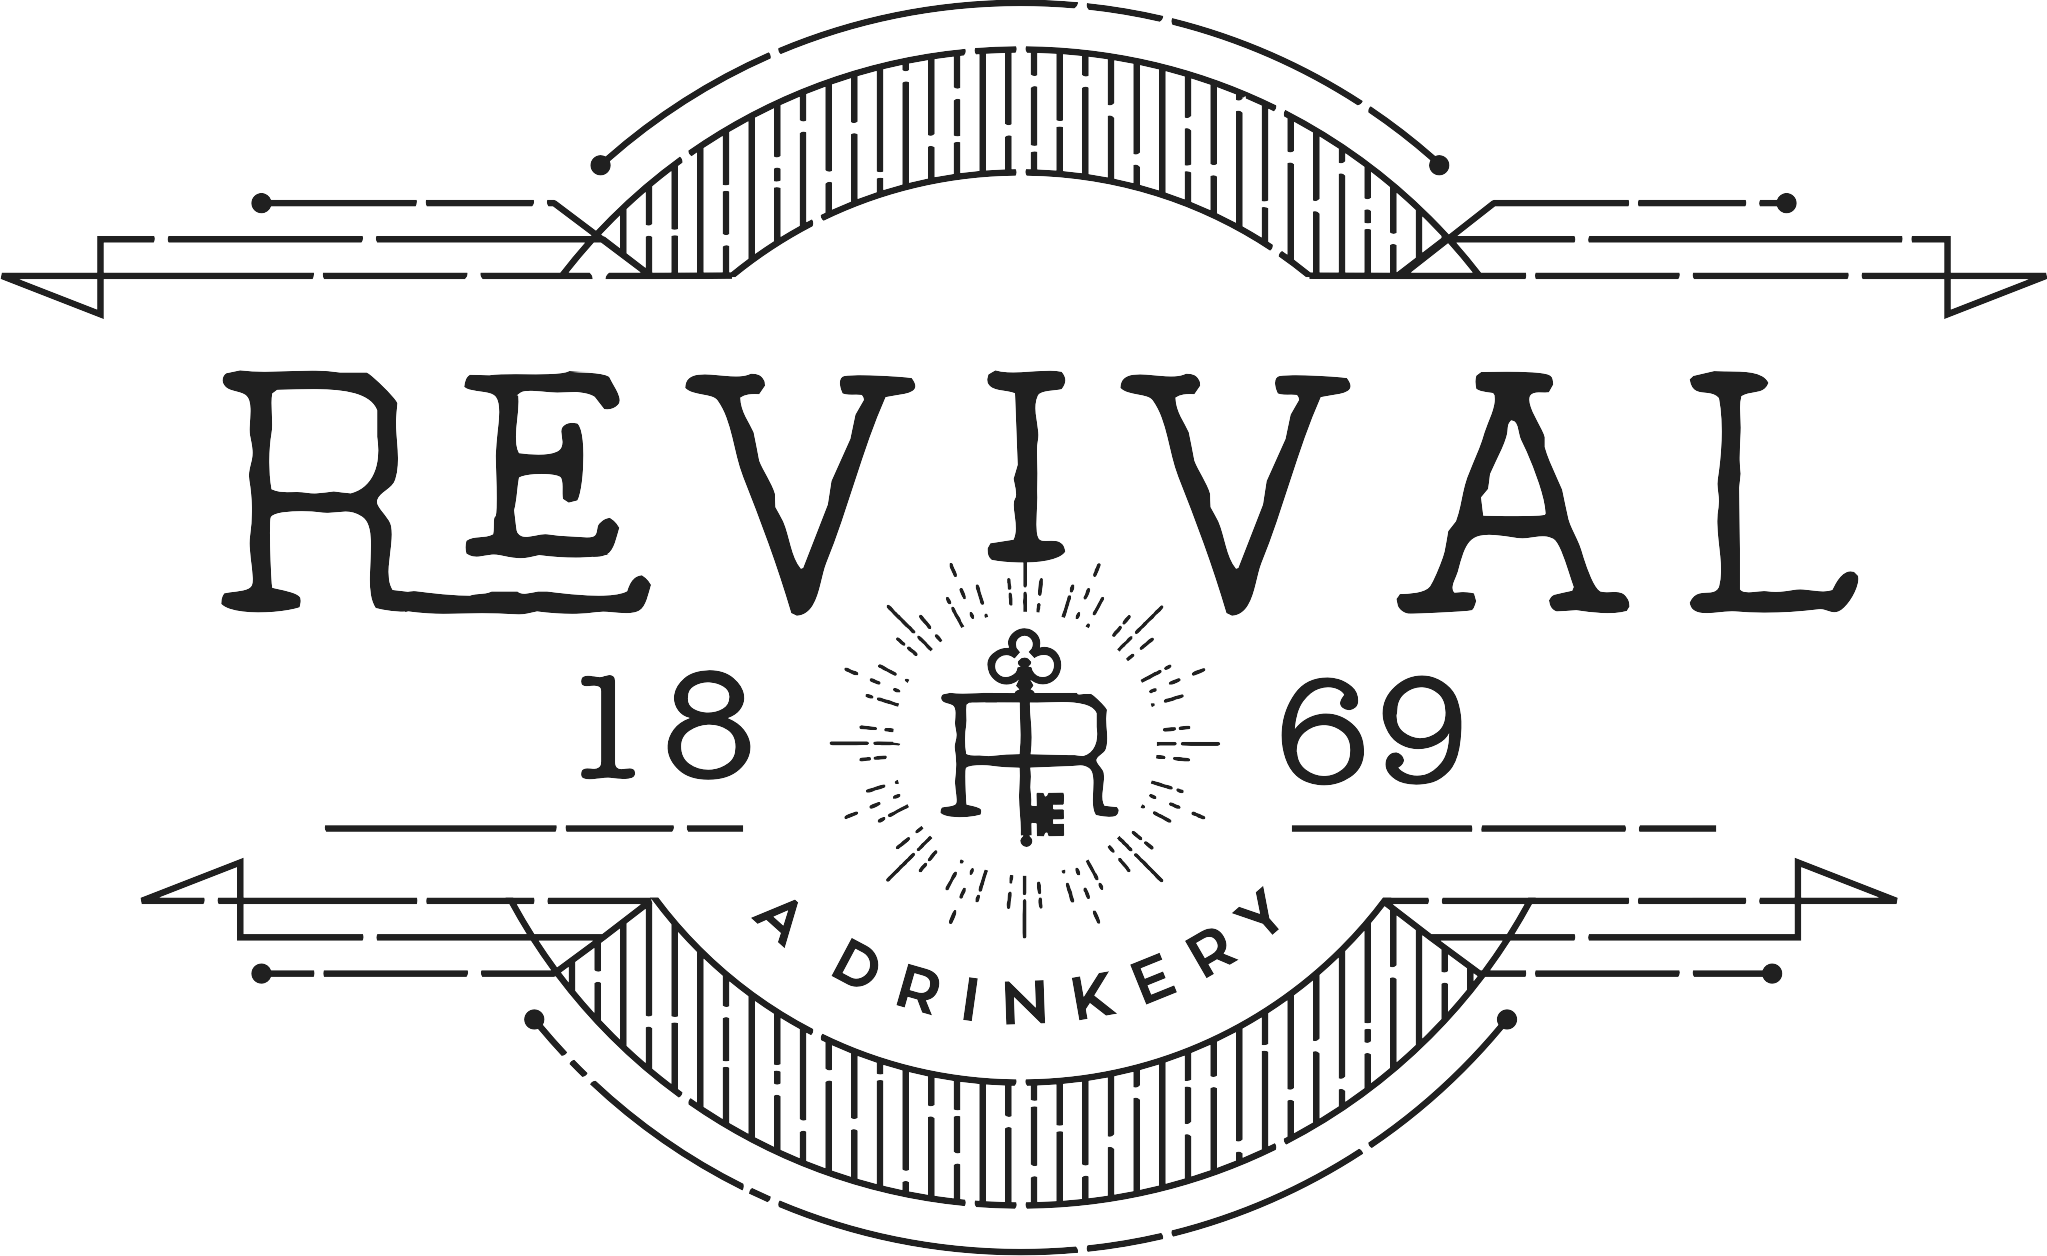 Sponsor Revival 1869